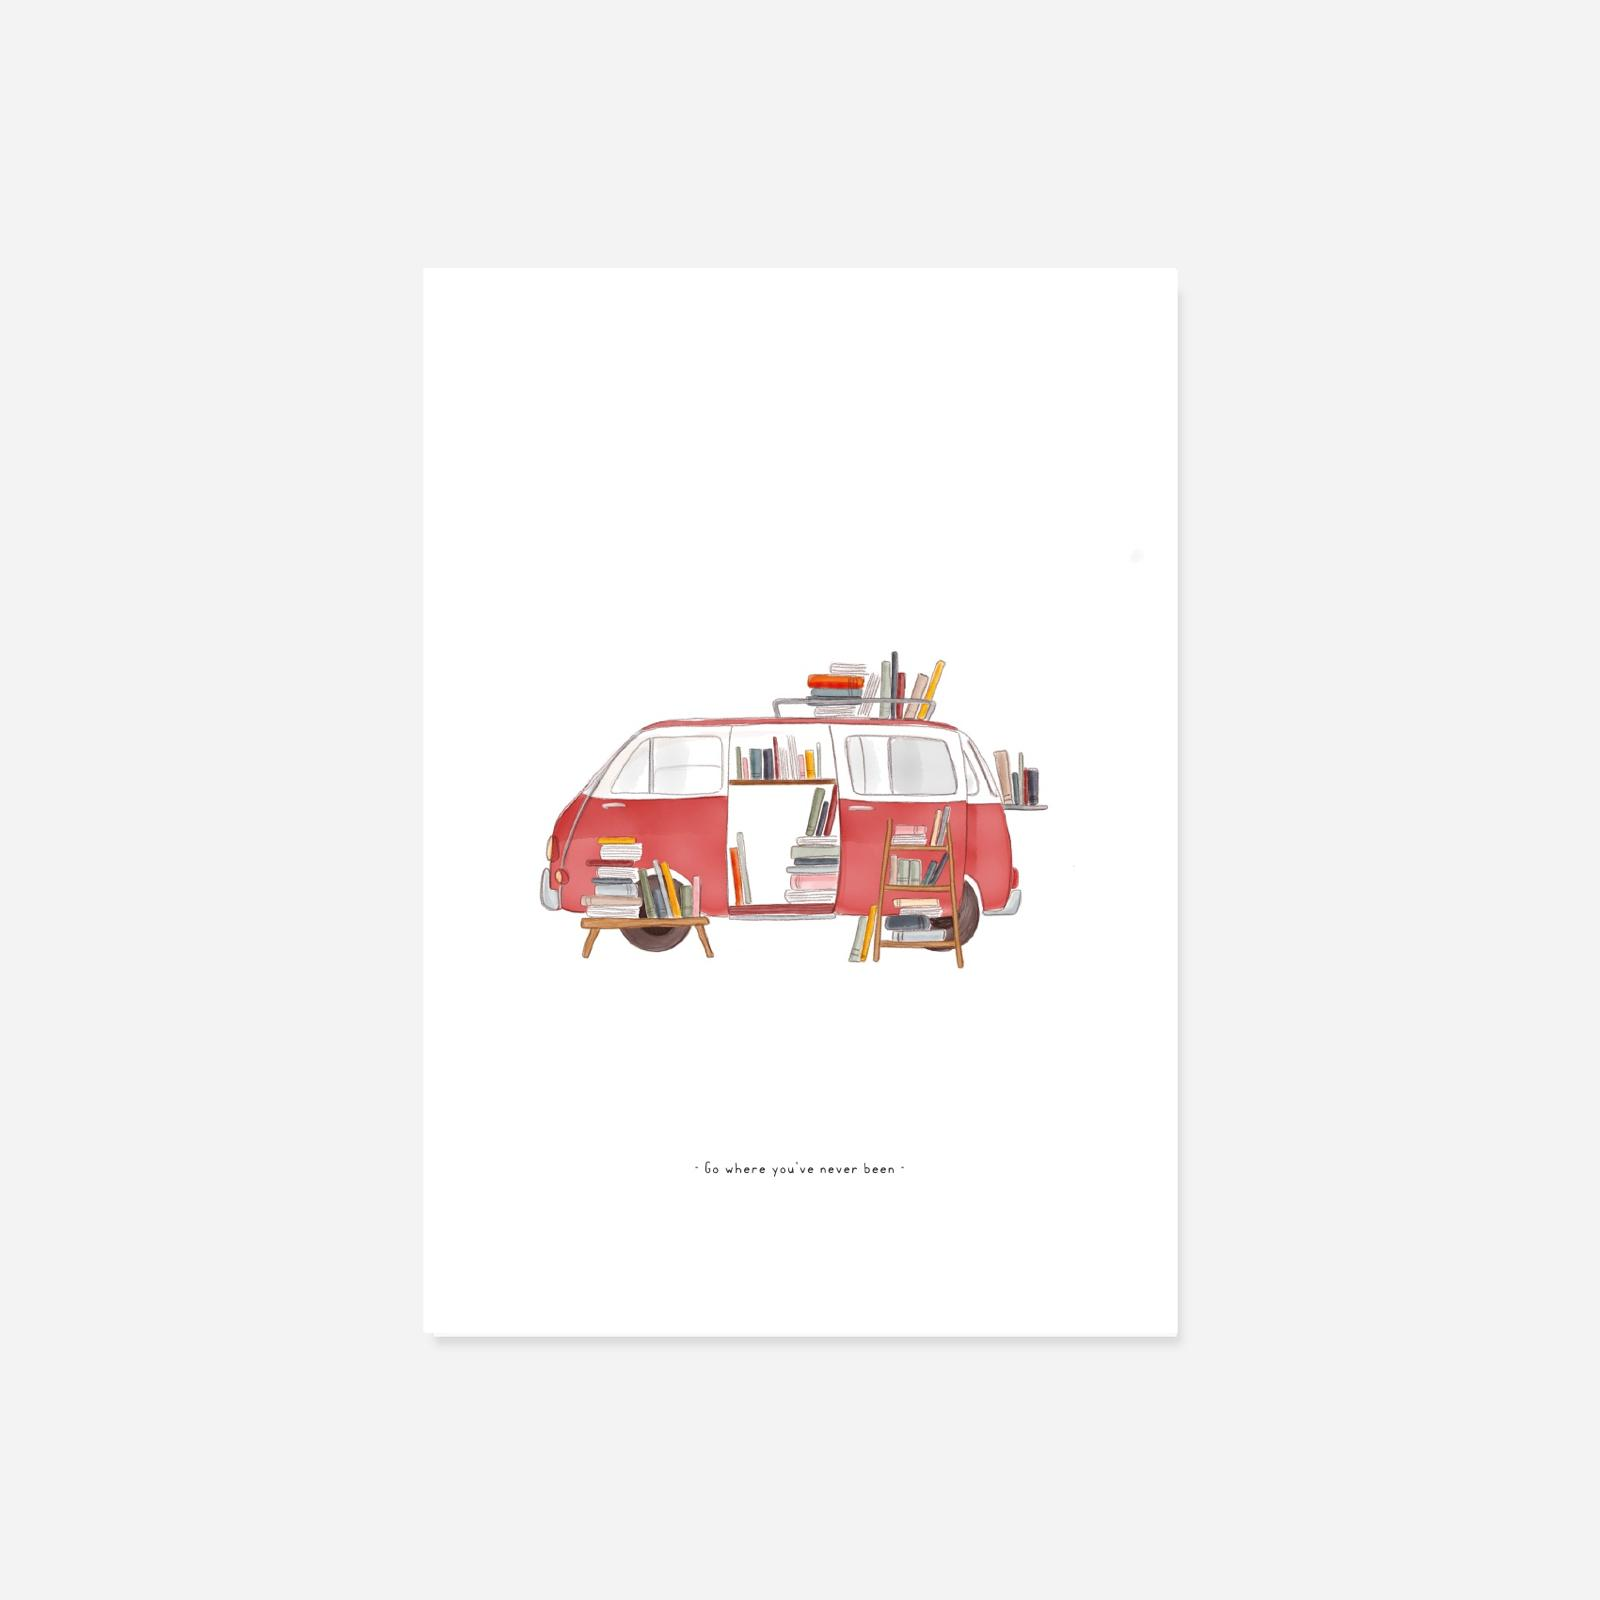 Illustratie Boekenbus